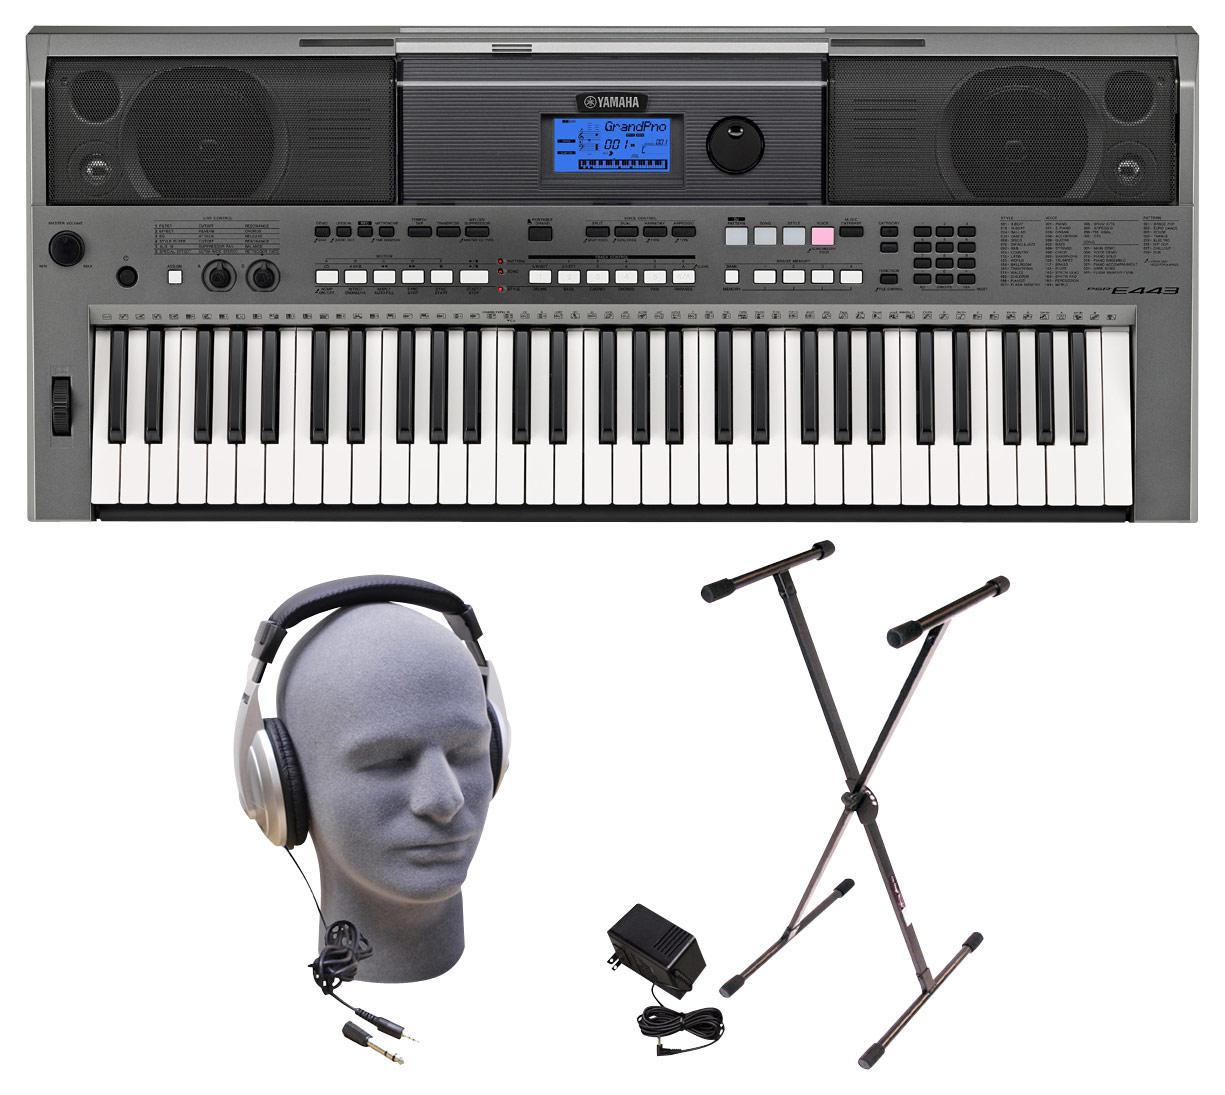 Yamaha - PSR Series PSRE443 Portable Keyboard with 61 Piano-Style Touch-Sensitive Keys - Gray